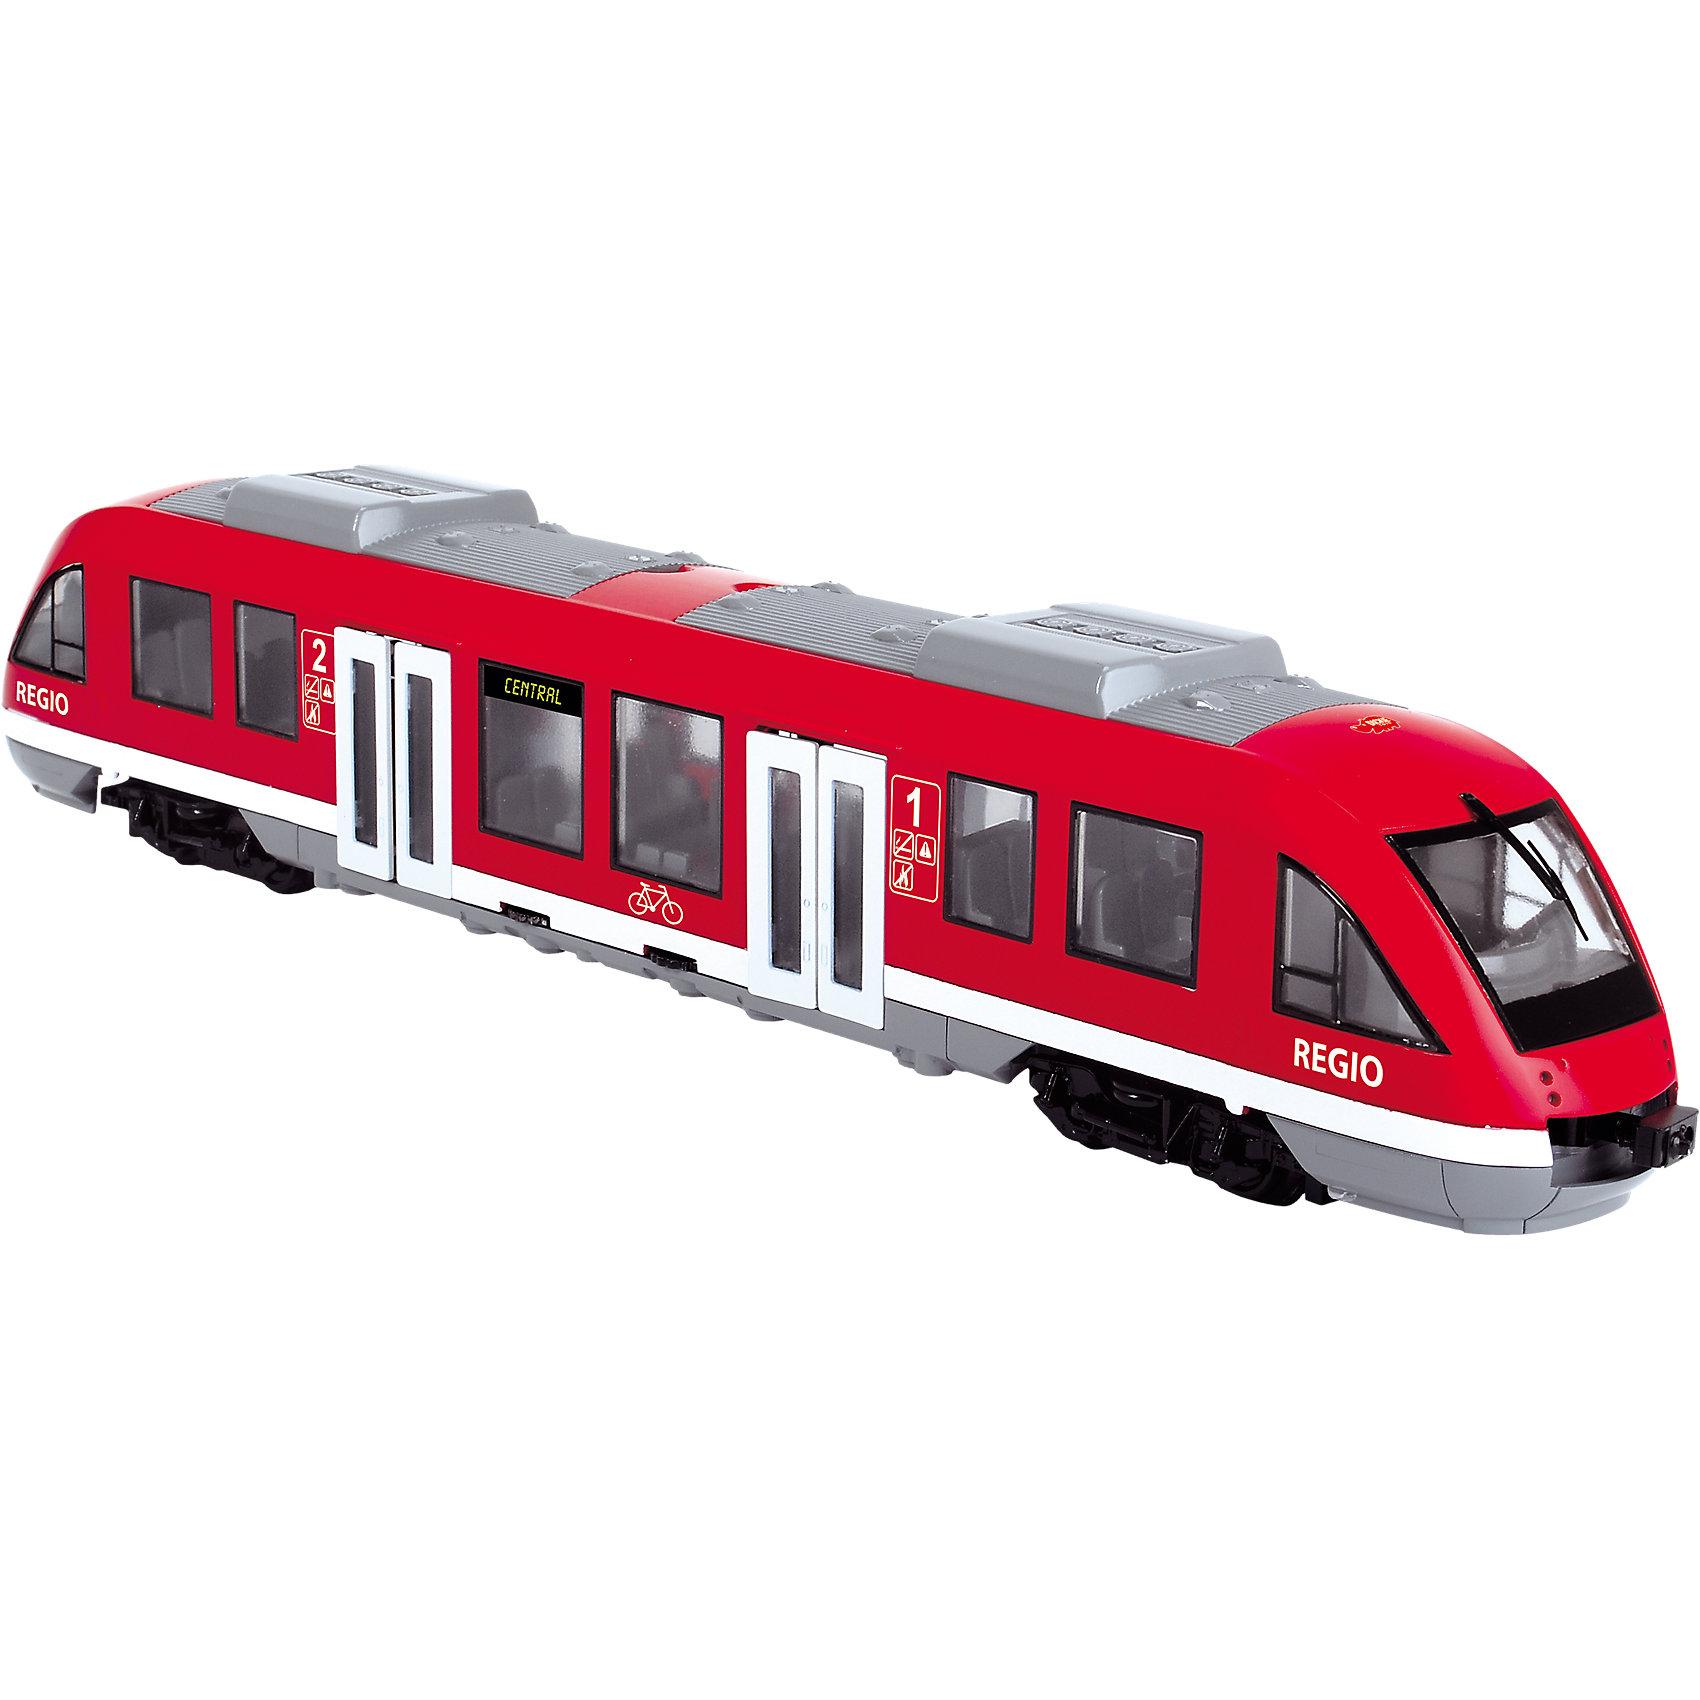 Городской поезд, 1:43, 45см, Dickie Toys<br><br>Ширина мм: 500<br>Глубина мм: 129<br>Высота мм: 86<br>Вес г: 529<br>Возраст от месяцев: 36<br>Возраст до месяцев: 84<br>Пол: Мужской<br>Возраст: Детский<br>SKU: 4608002